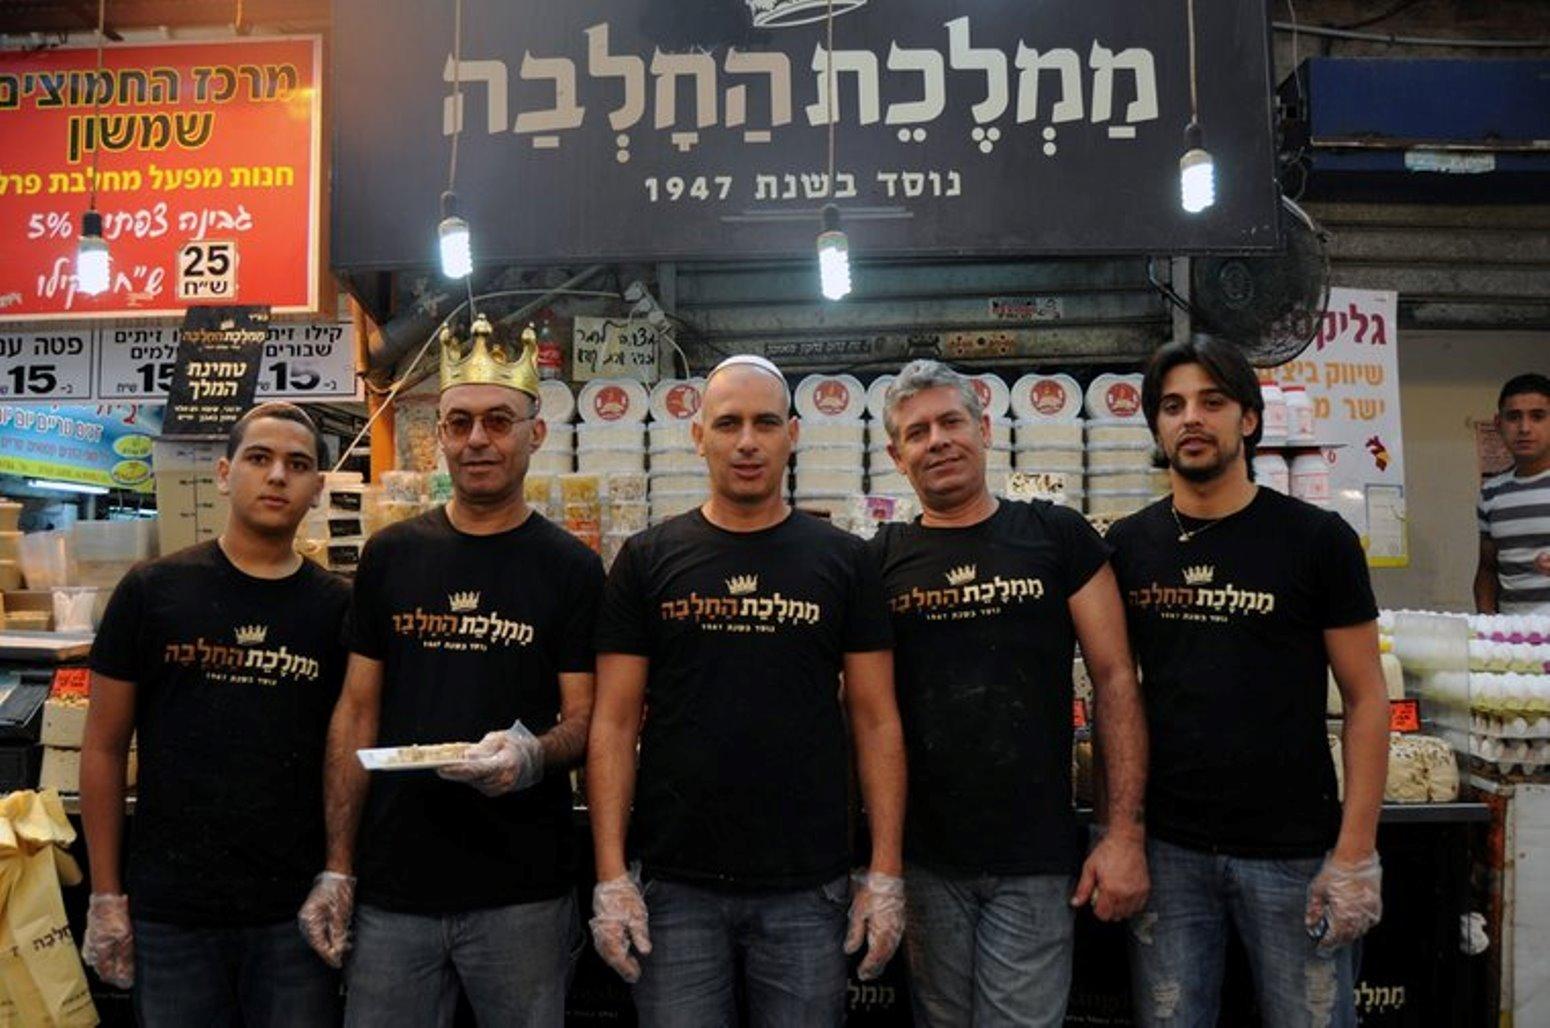 Halva Kingdom in Machane Yehuda market in Jerusalem. Photo courtesy of Halva Kingdom